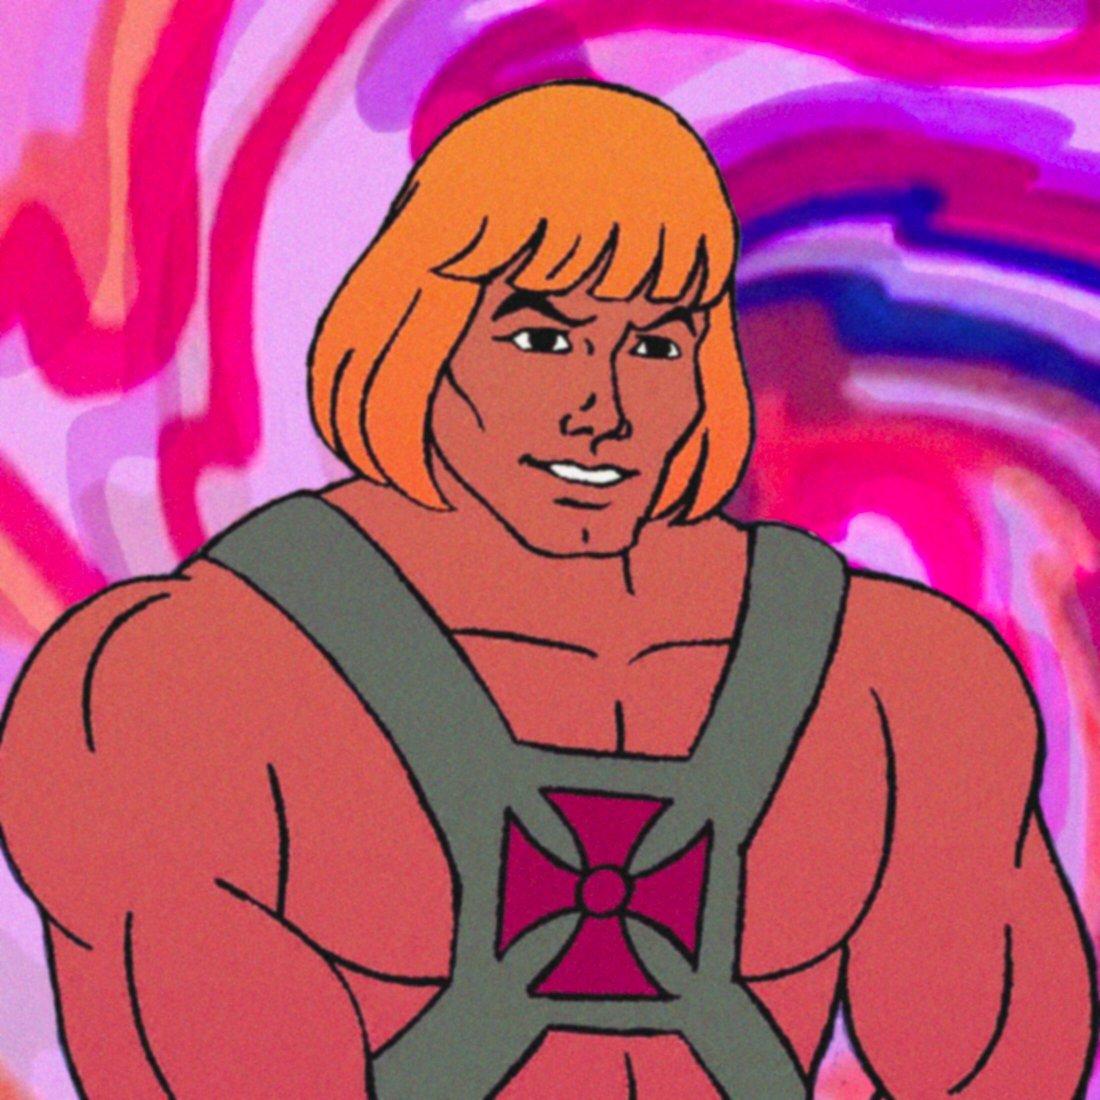 he-man-gayest-episode-ever.jpg